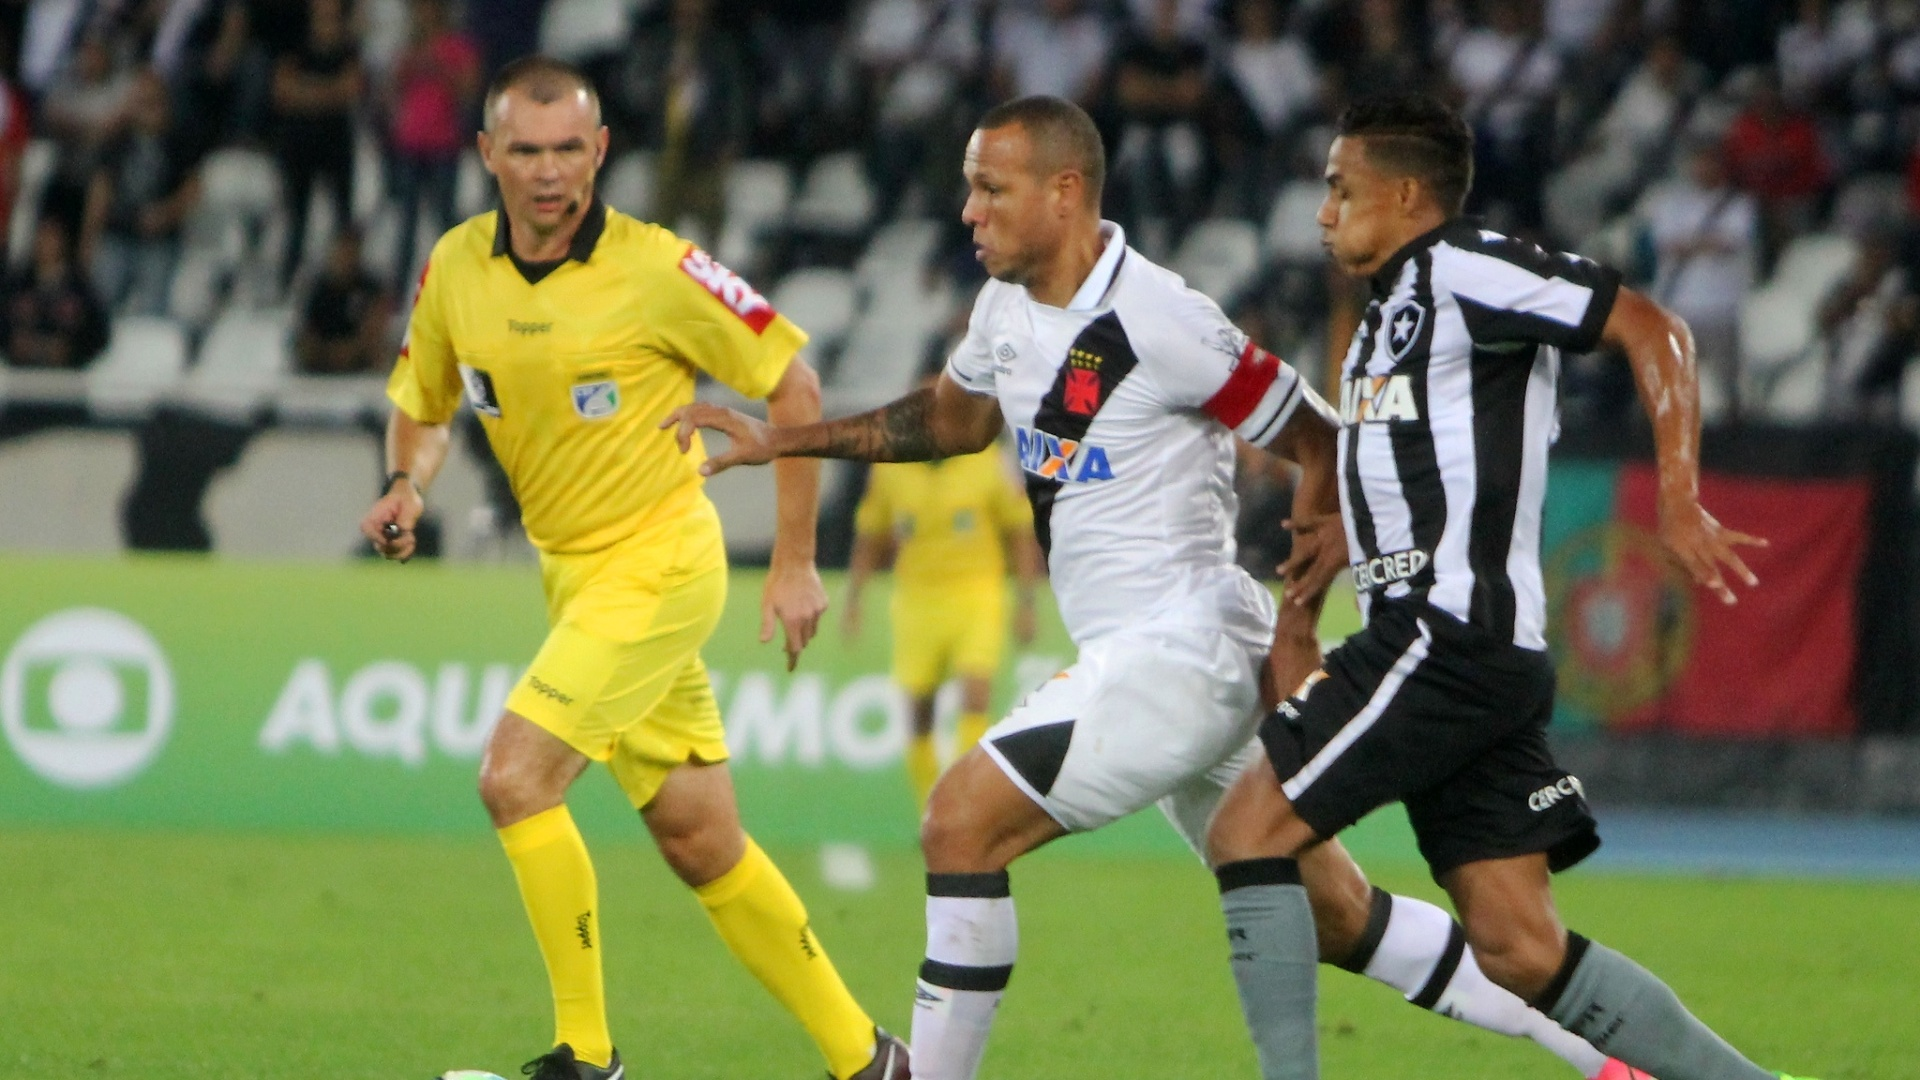 Observado pelo árbitro Leandro Vuaden, Luís Fabiano conduz a bola na partida Botafogo x Vasco